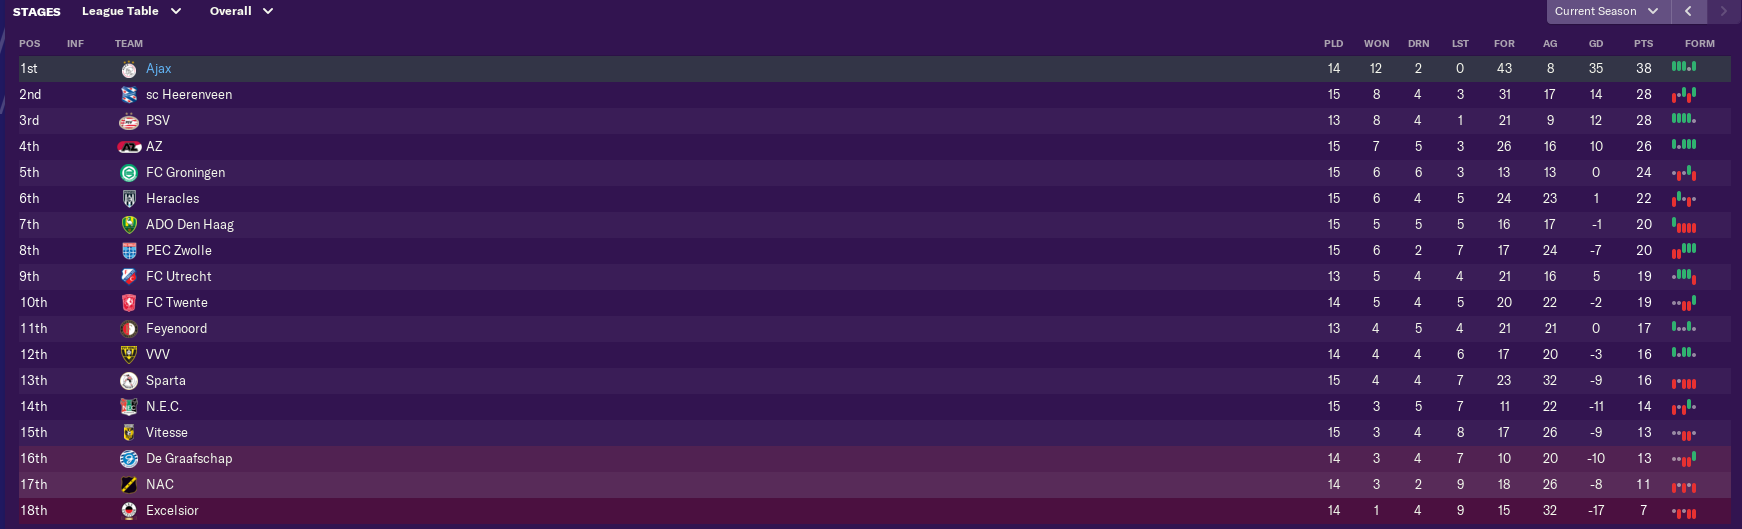 november-league-table.png